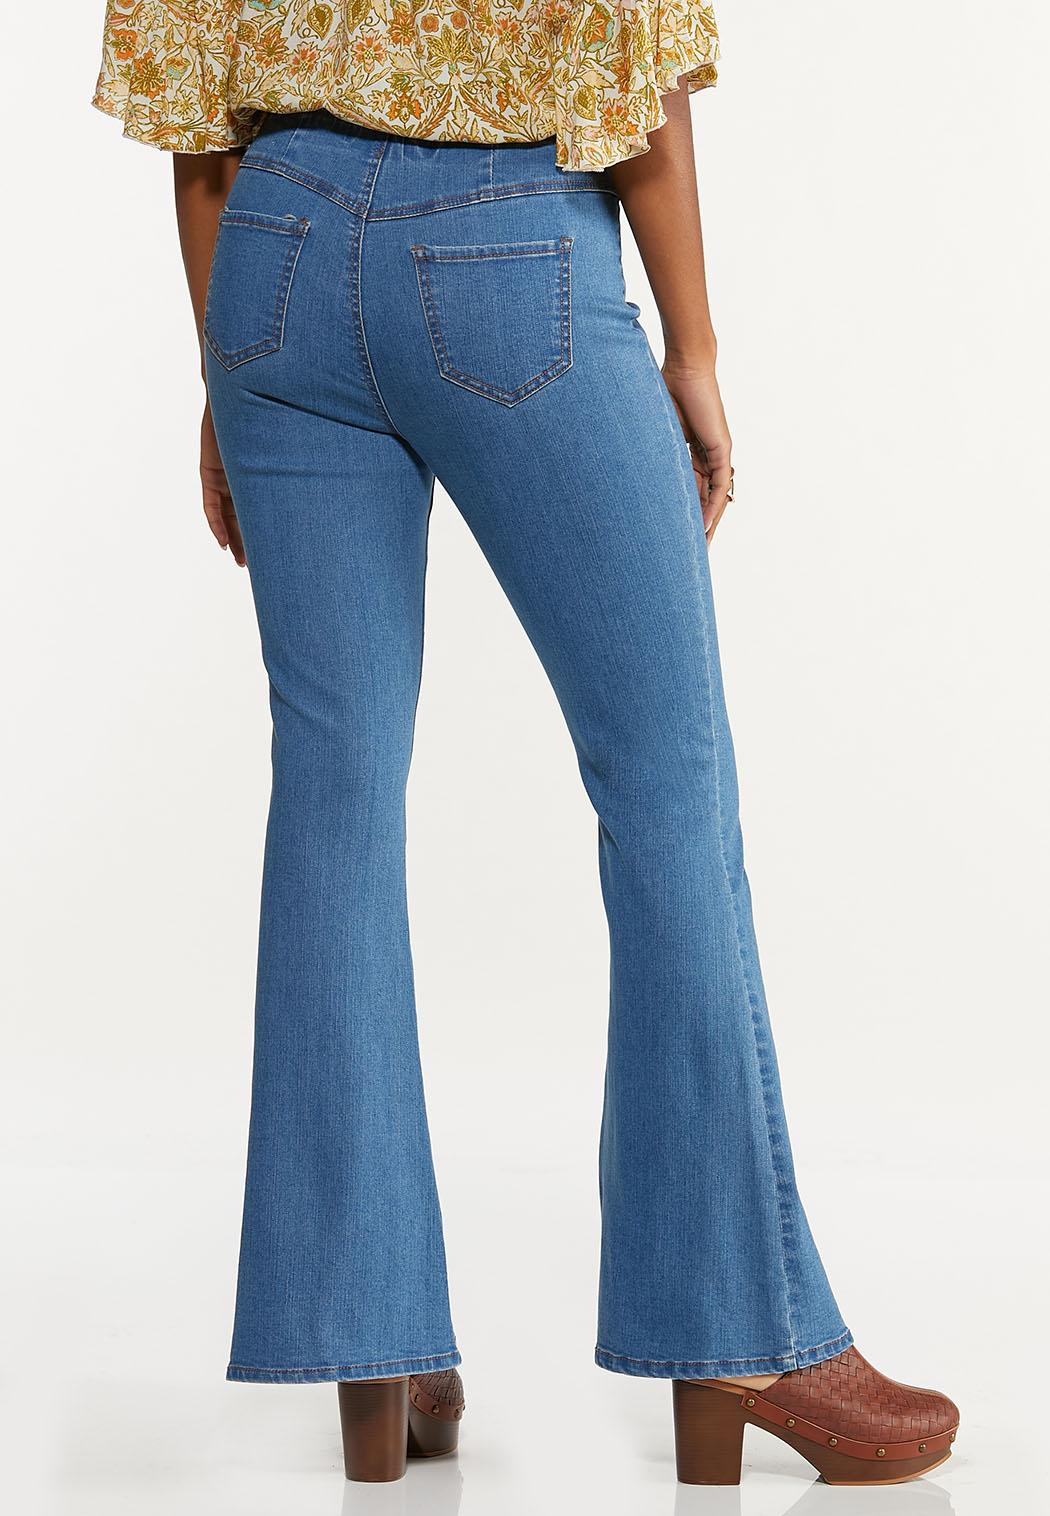 Petite Pull-On Flare Jeans (Item #44645559)